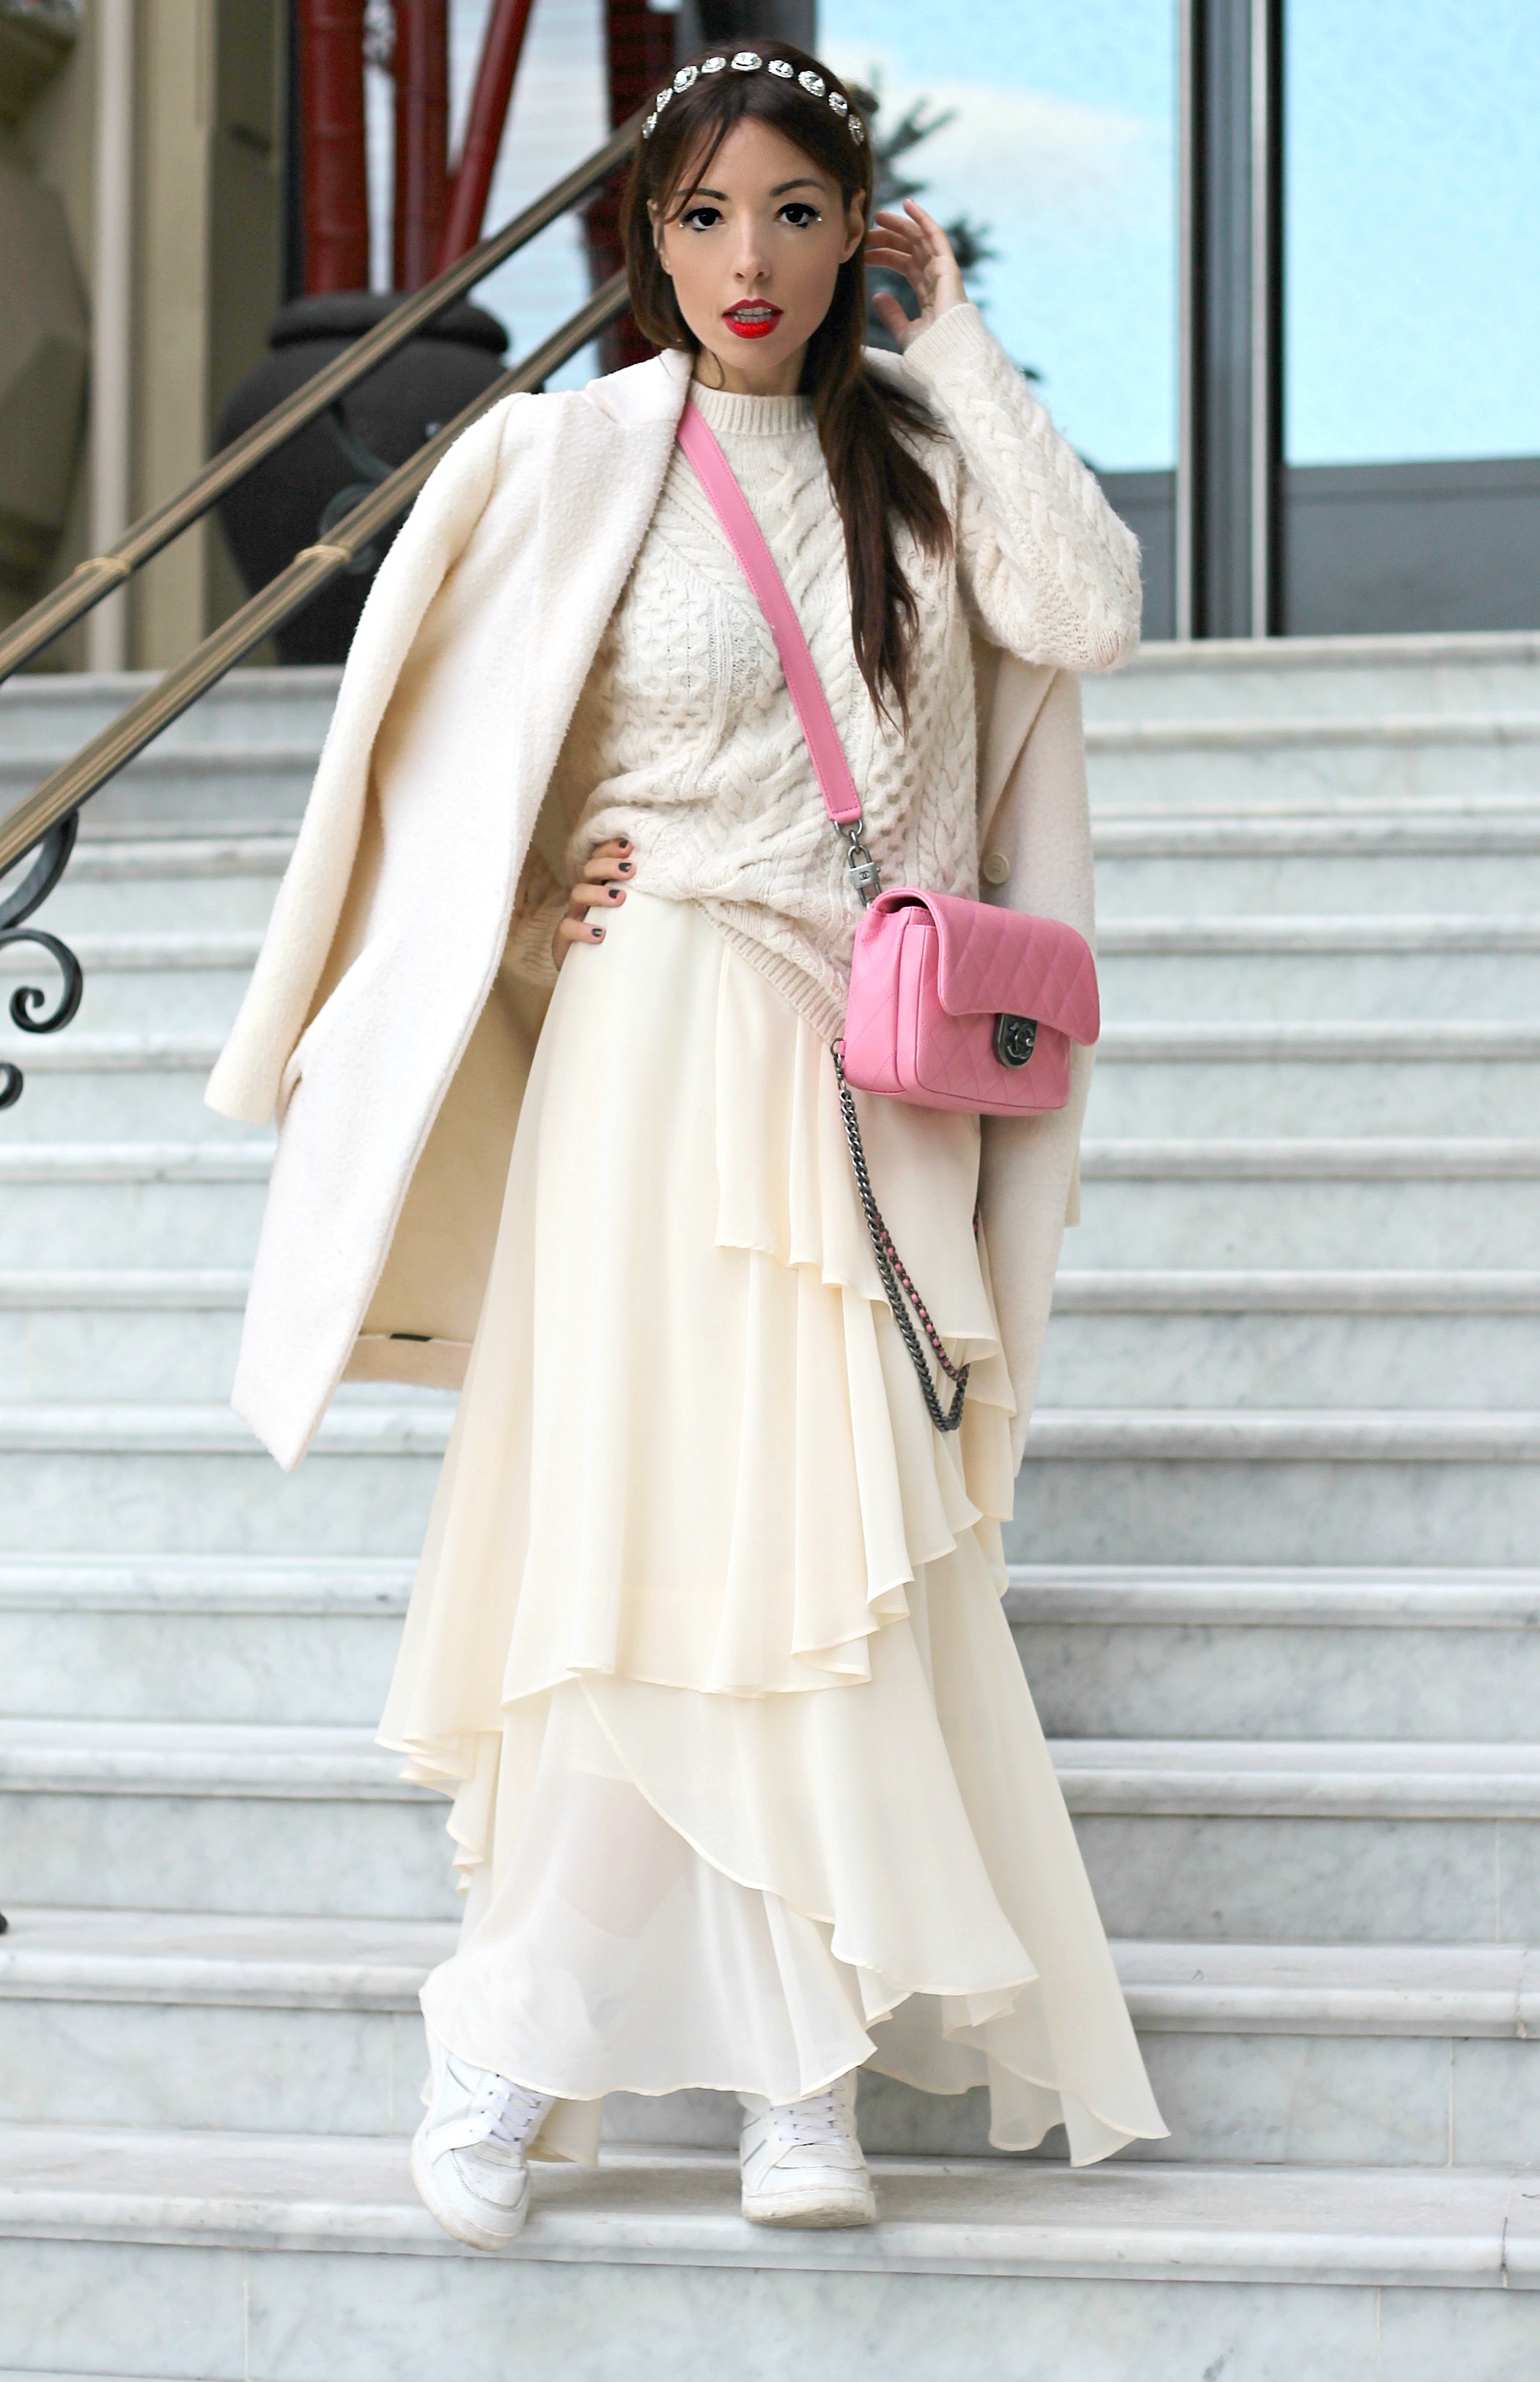 elisa bellino, theladycracy.it, fashin blogger famose, chanel borsa rosa,prospettive lavoro futuro, total white look, zarina outfit, chanel rosa borsa,